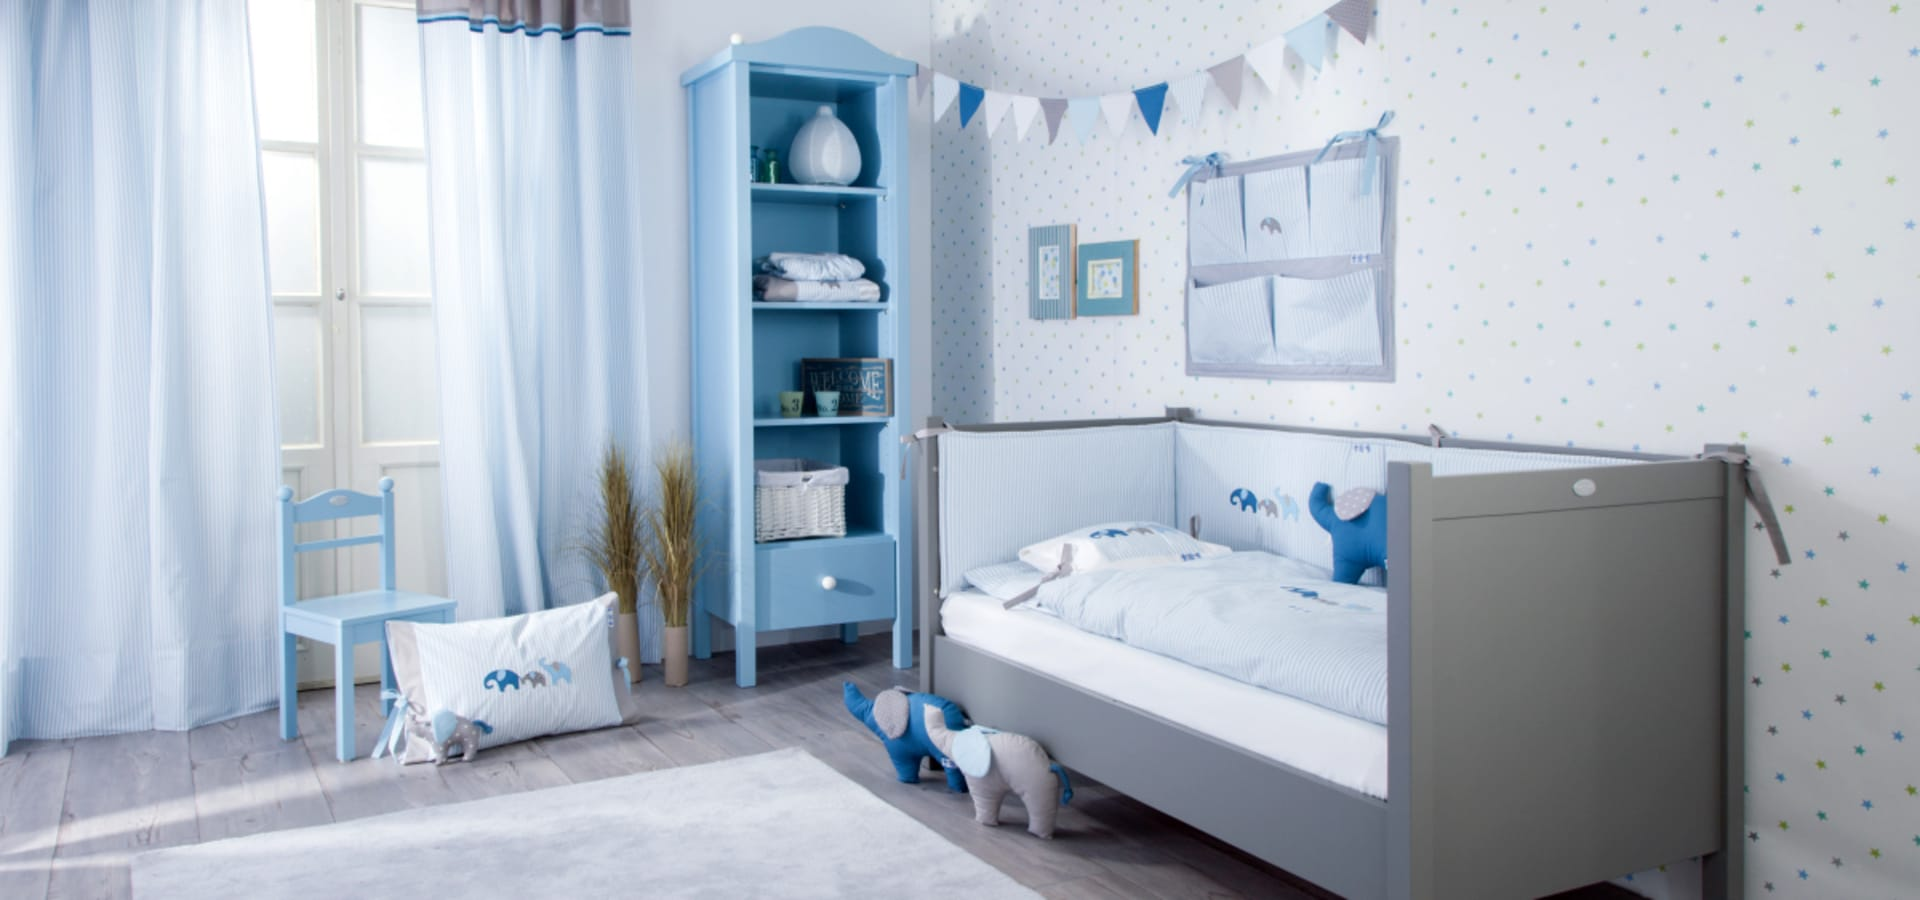 Fantasyroom-Wohnträume für Kinder